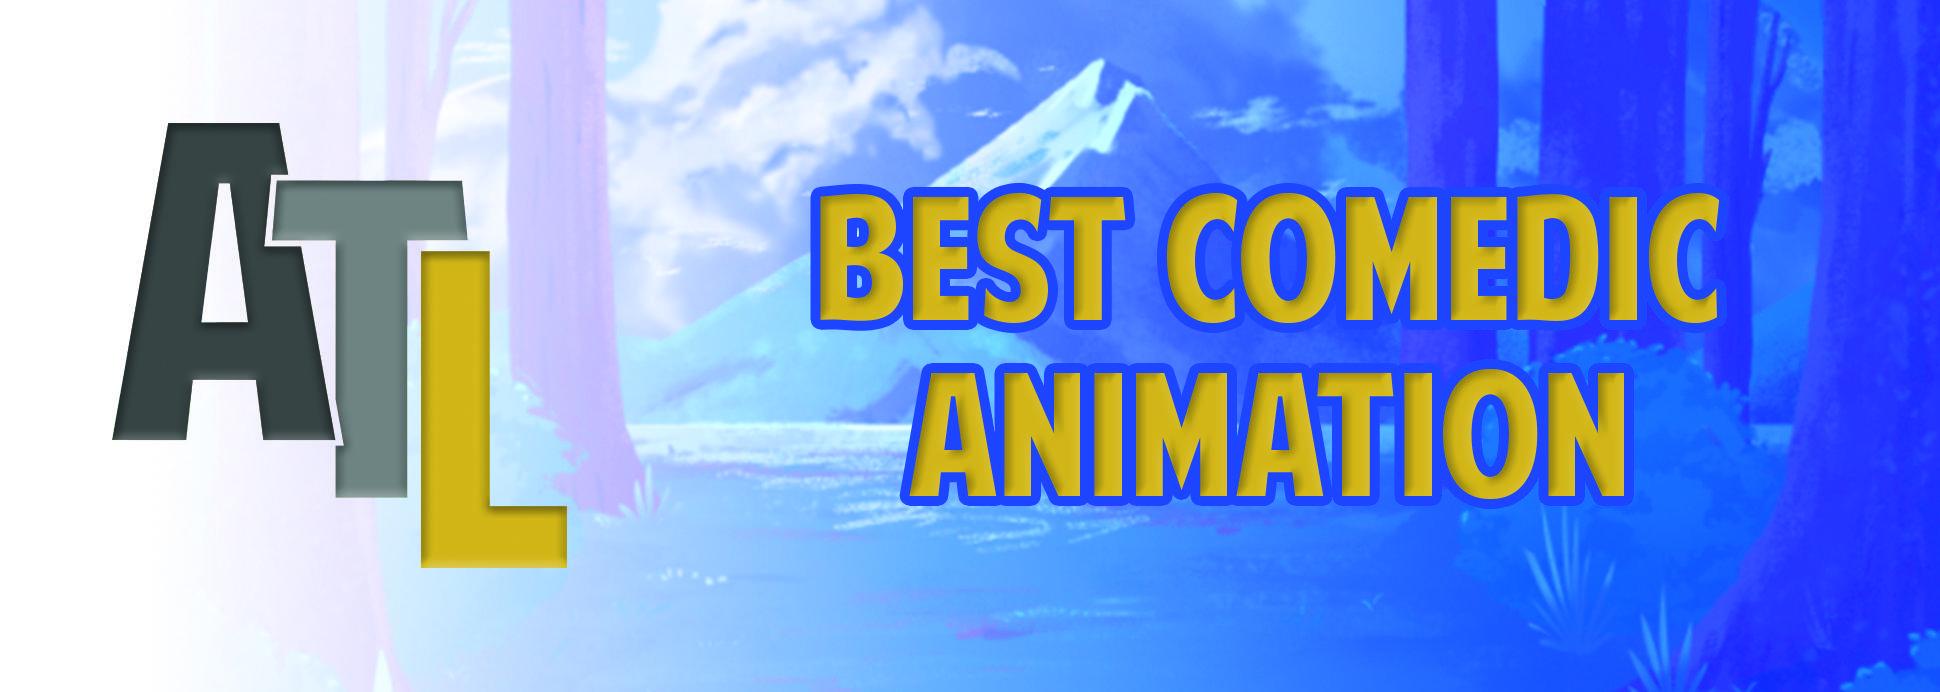 Best Comedic Animation